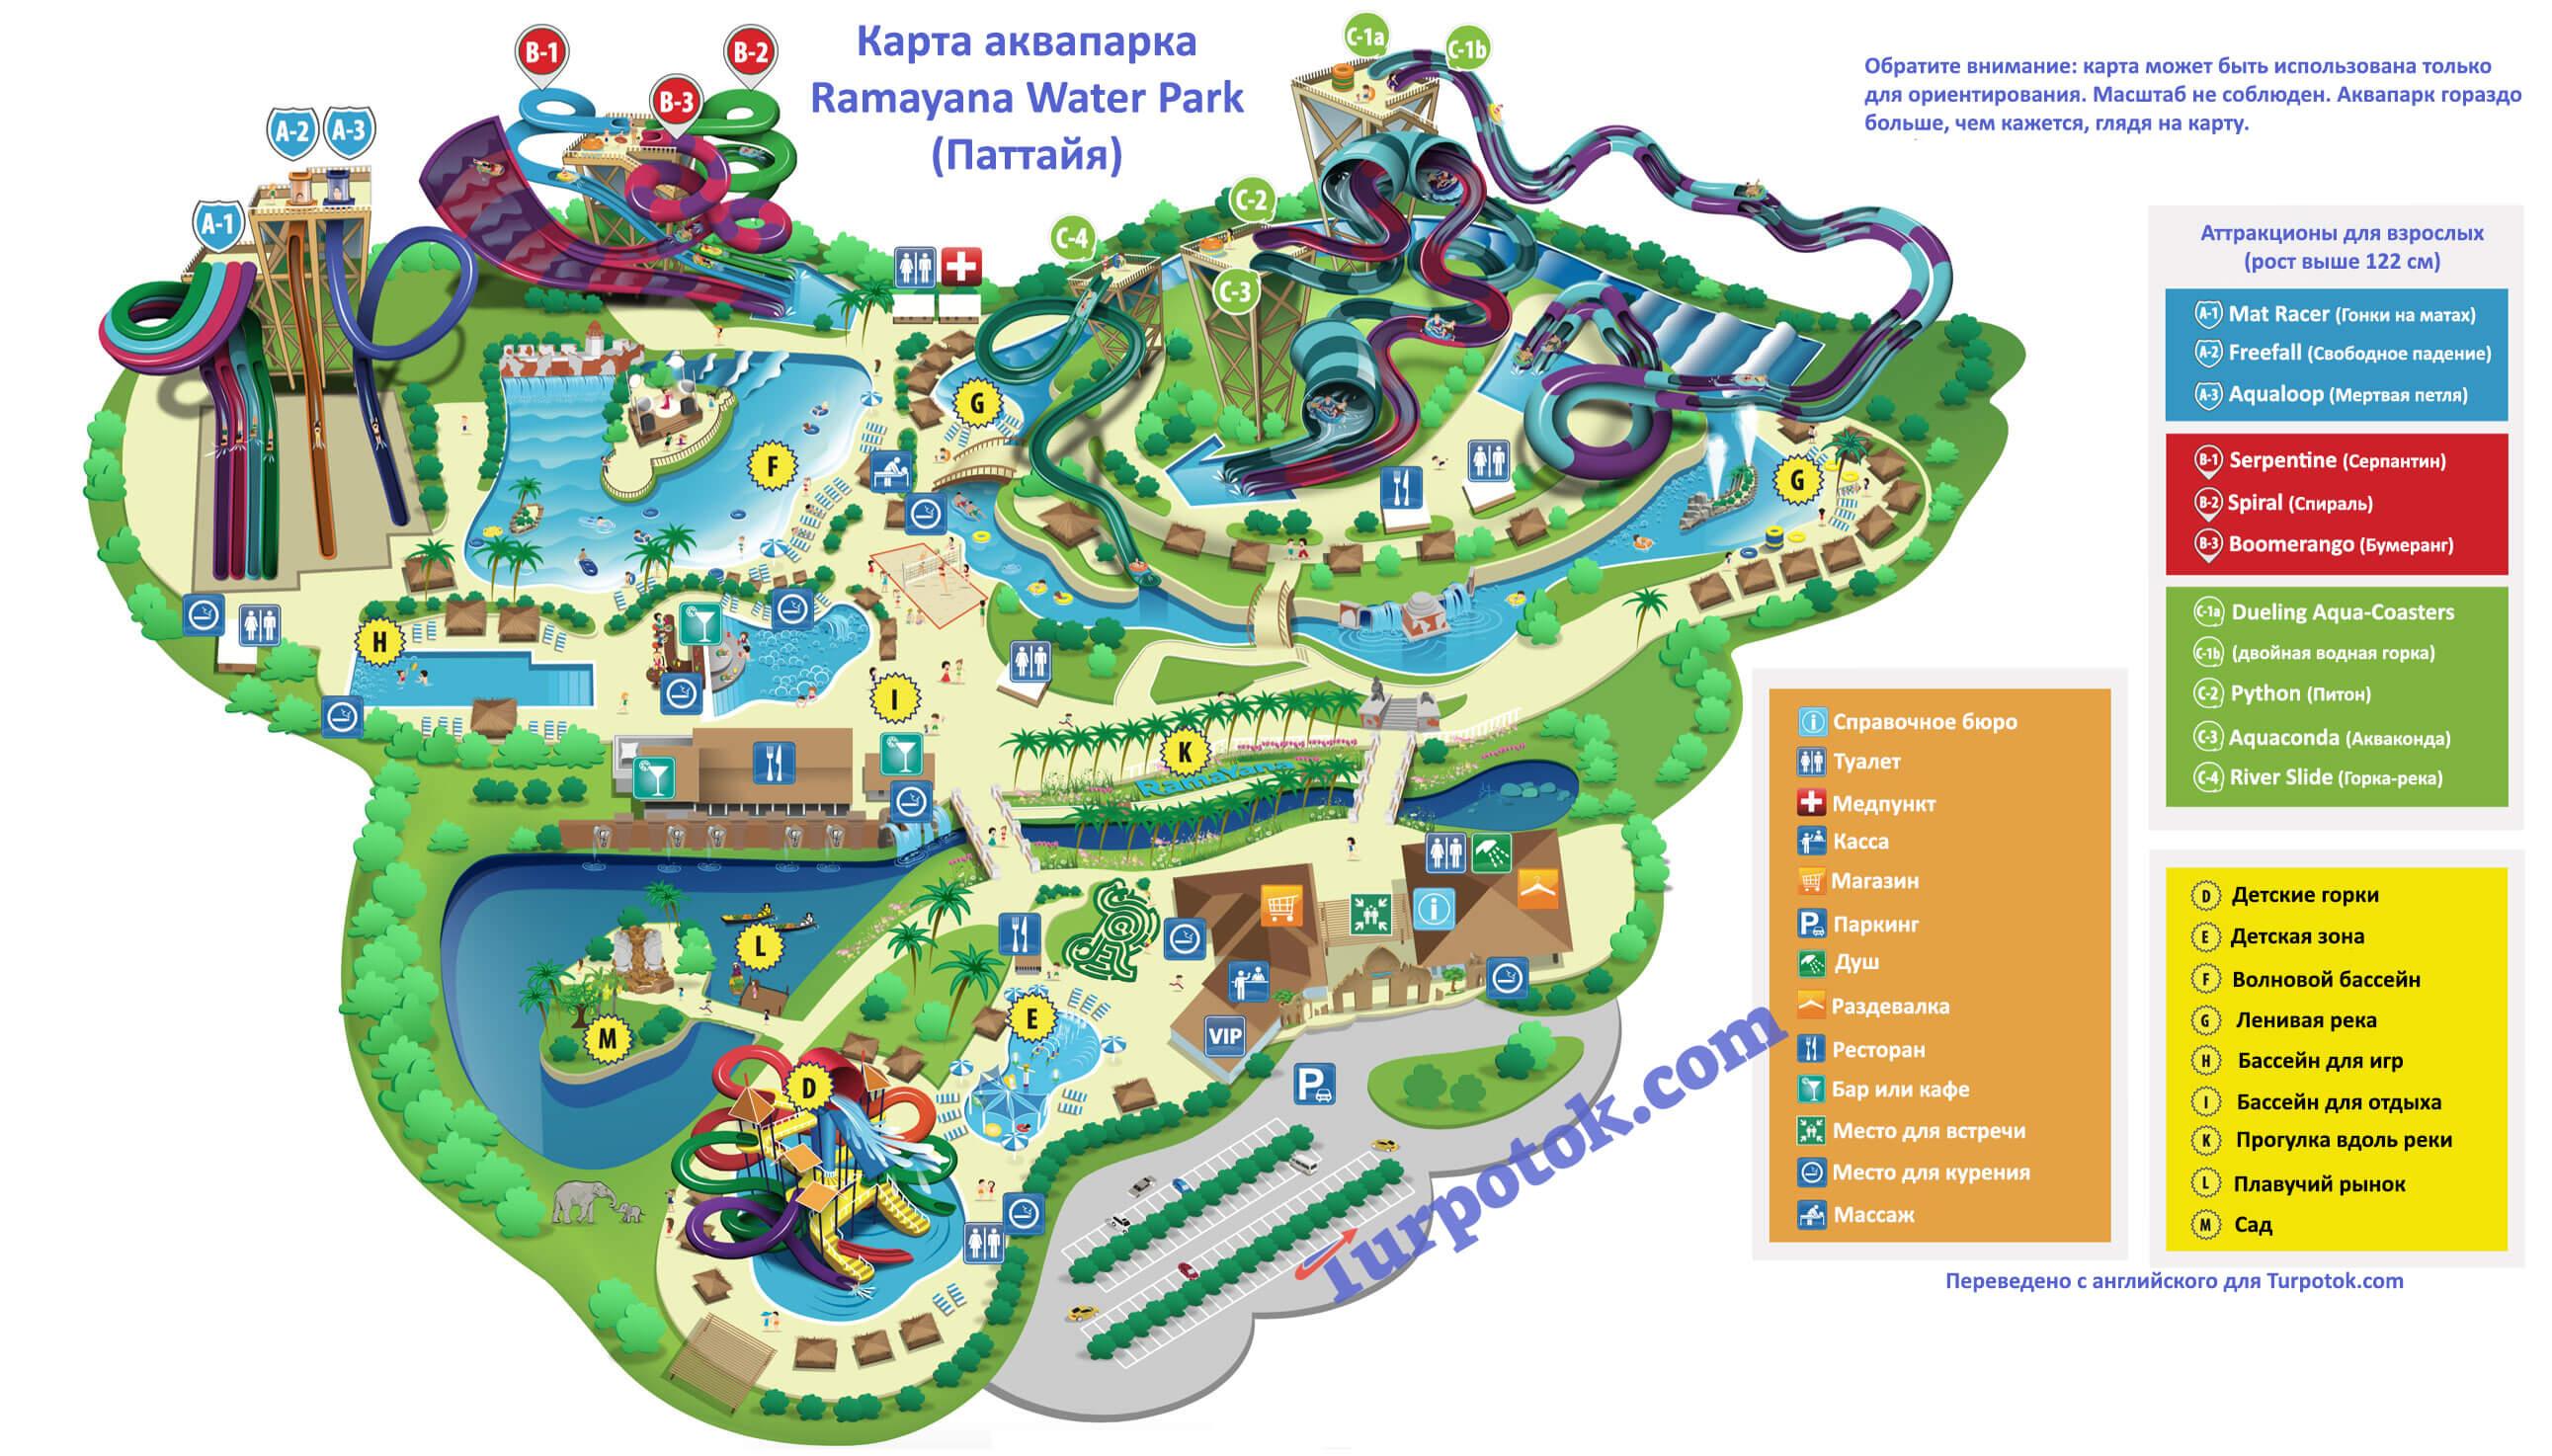 Карта аквапарка Ramayana Water Park Pattaya на русском